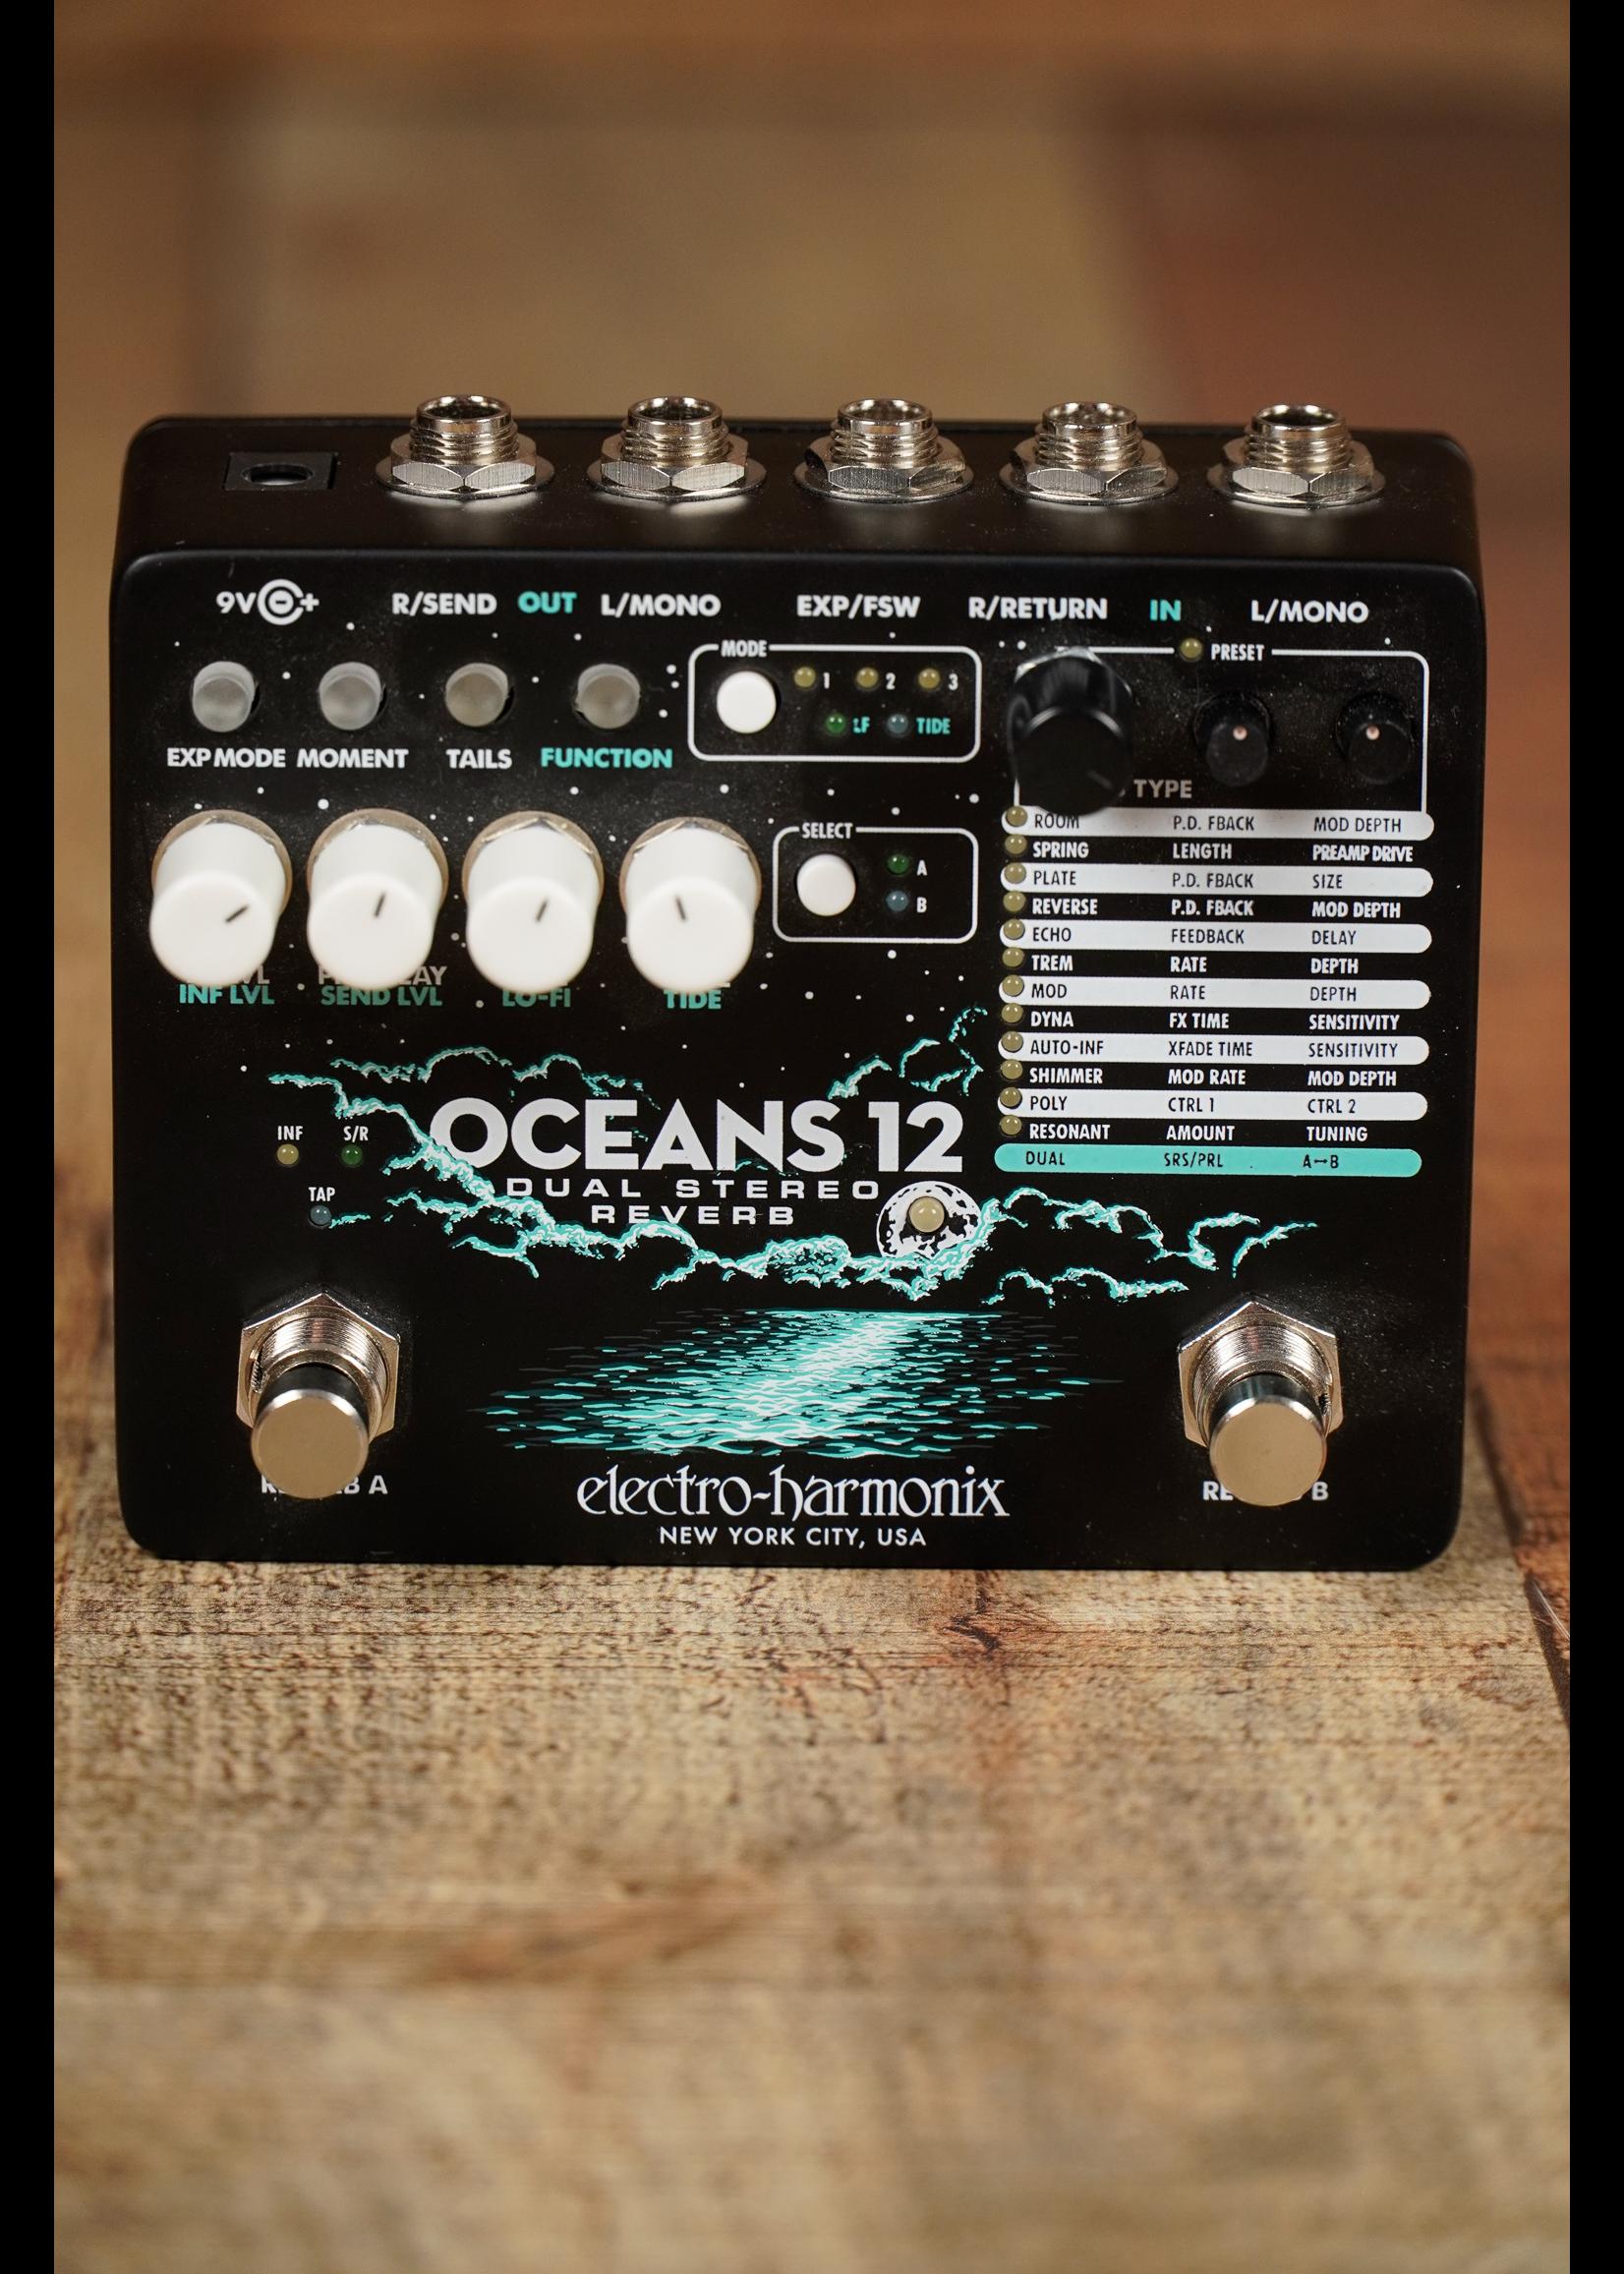 Electro-Harmonix Electro-Harmonix OCEANS 12 Dual Stereo Reverb, 9.6DC-200 PSU included